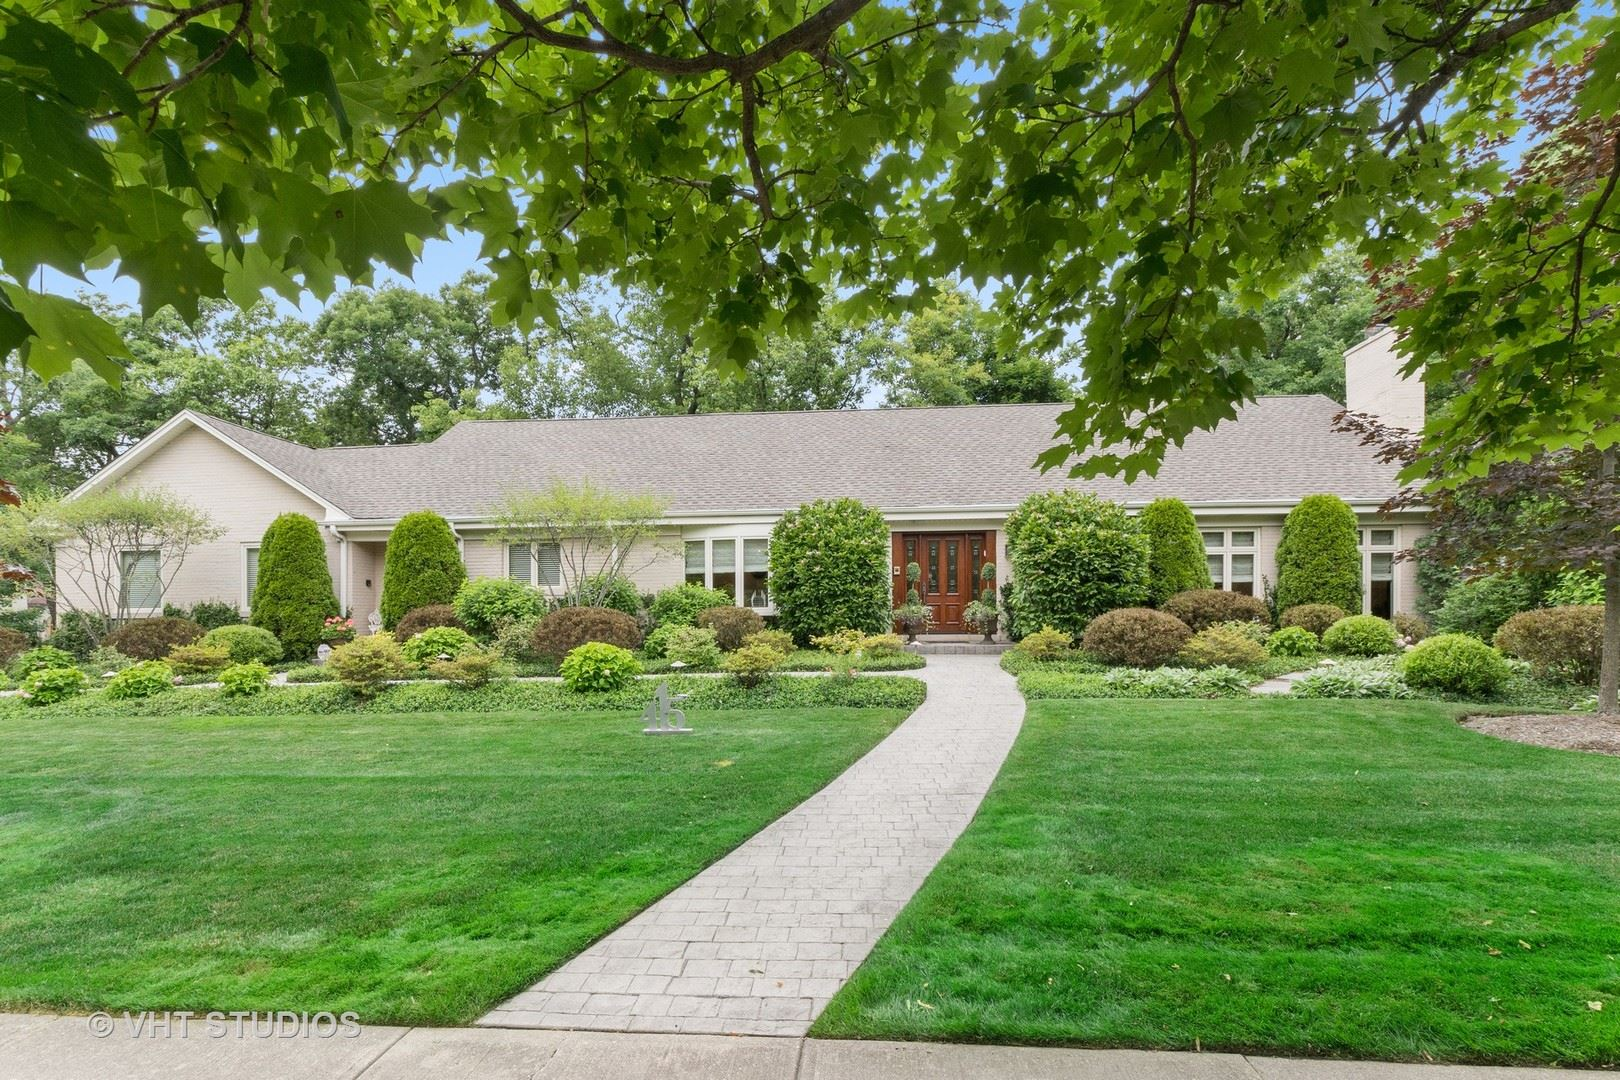 415 Lambert Tree Avenue, Highland Park, IL 60035 - #: 10784914